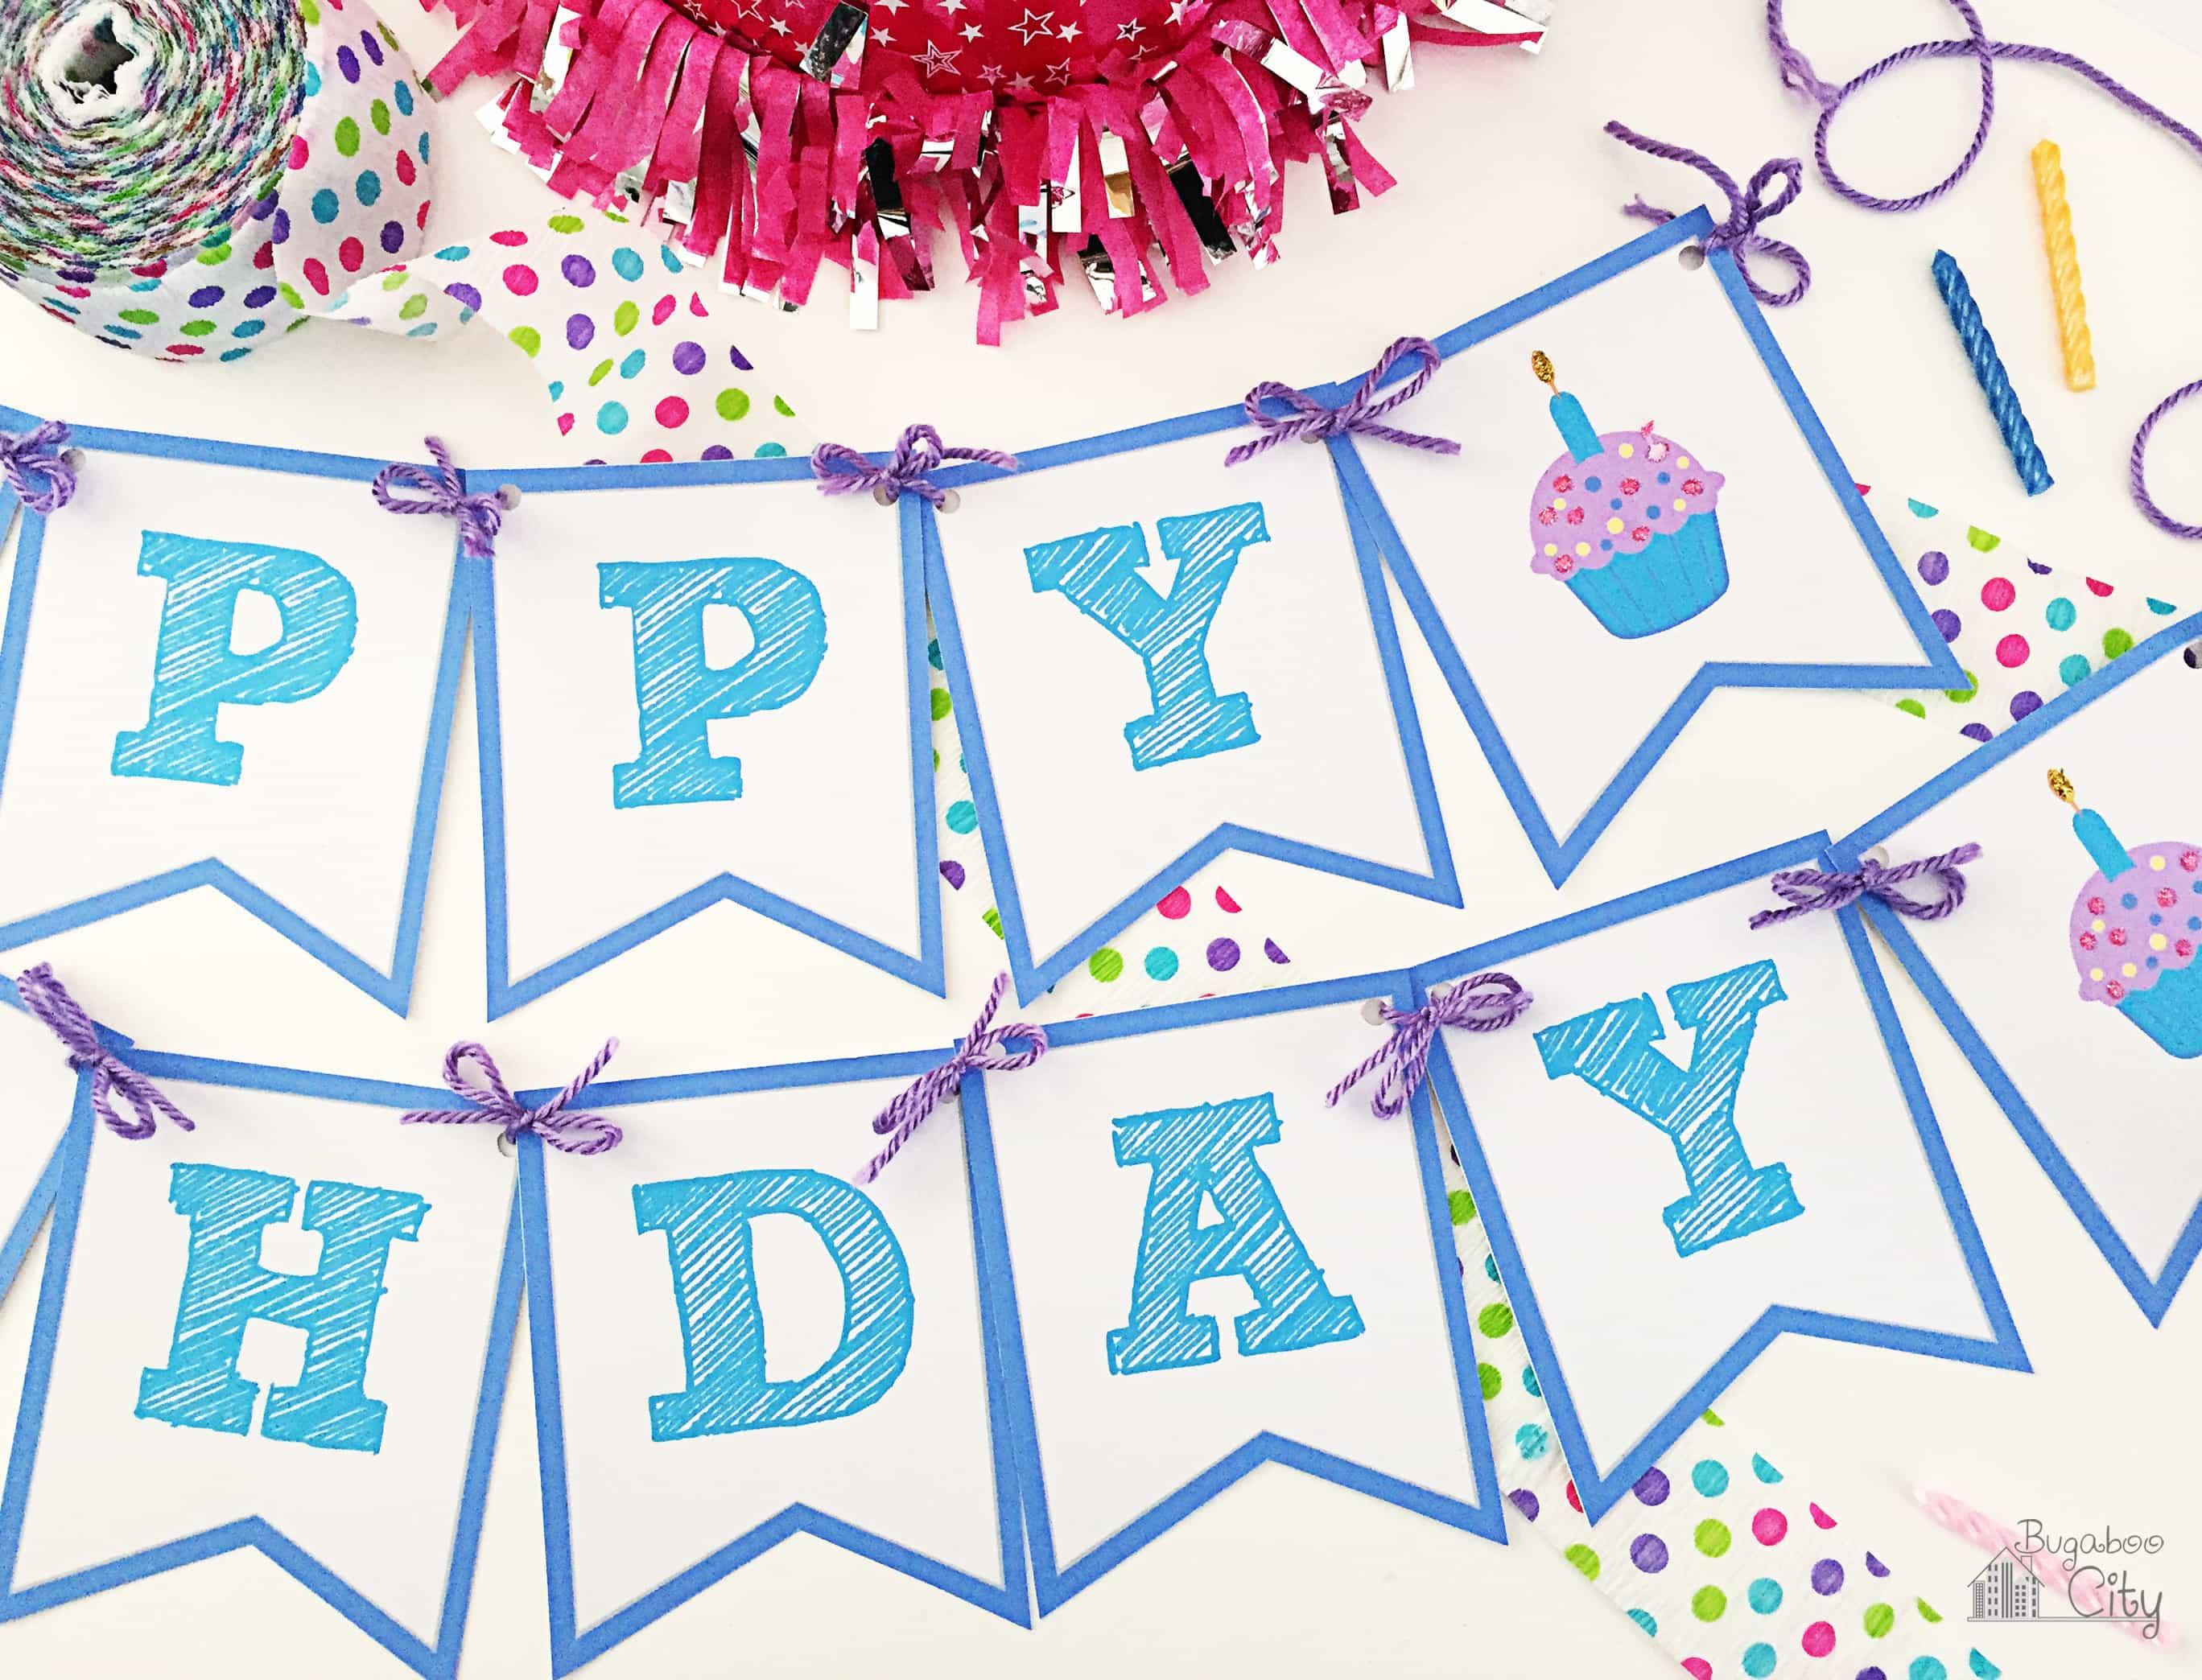 Happy Birthday Banner - Bugaboocity - Free Printable Happy Birthday Banner